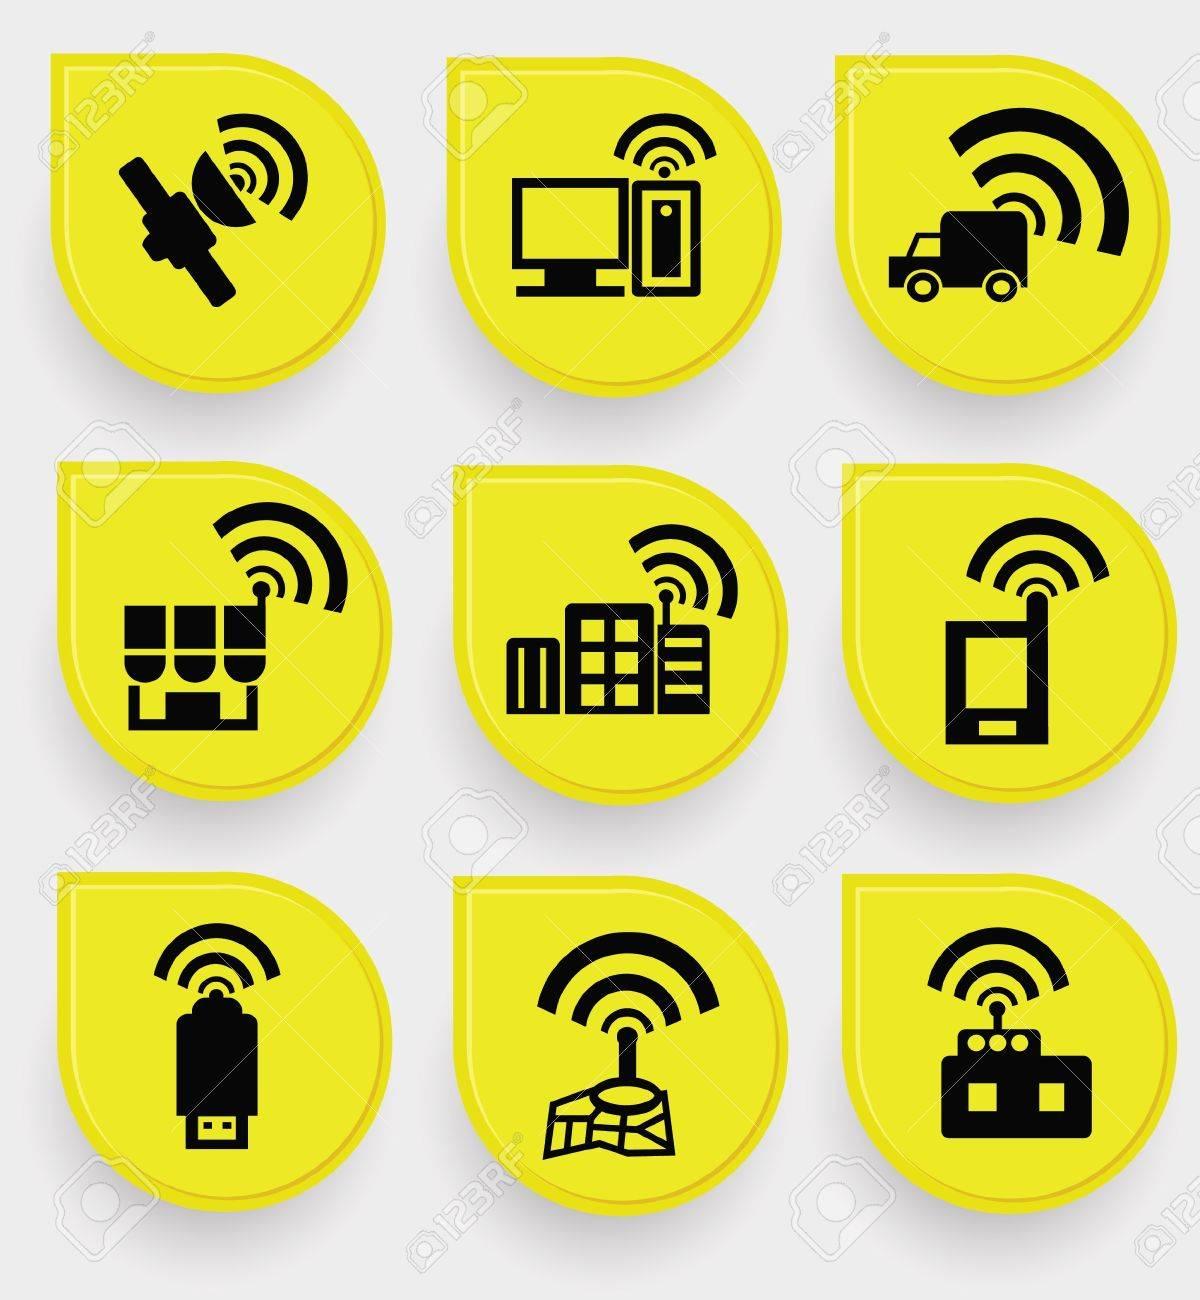 Wireless   communication icon set Stock Vector - 19973074